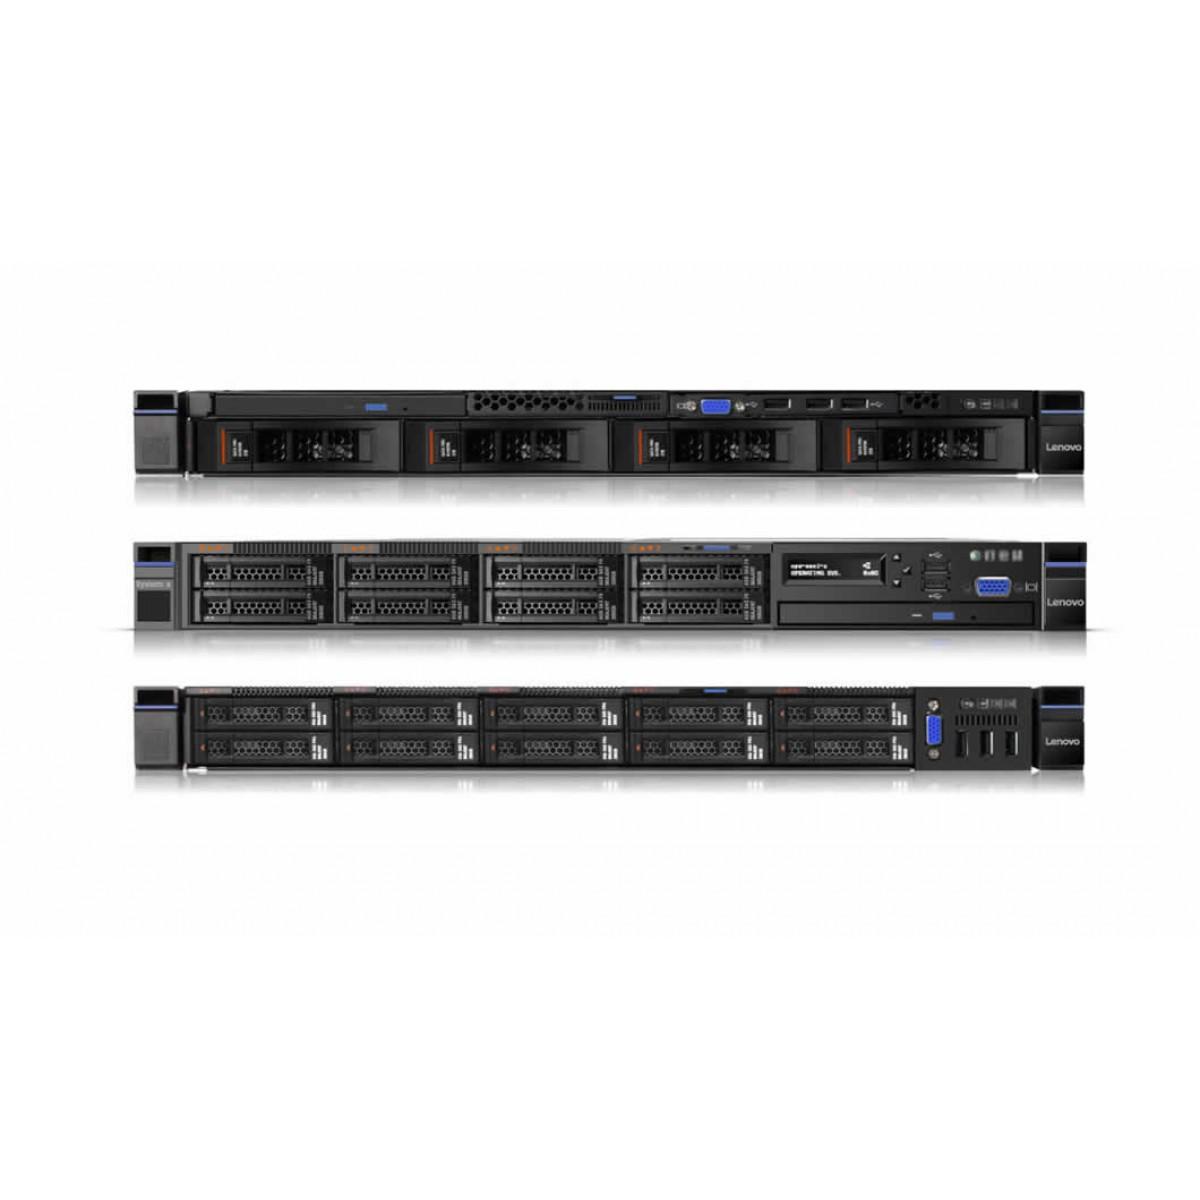 Lenovo System x3550 M5 8869 Server rackmountable 1U 2way